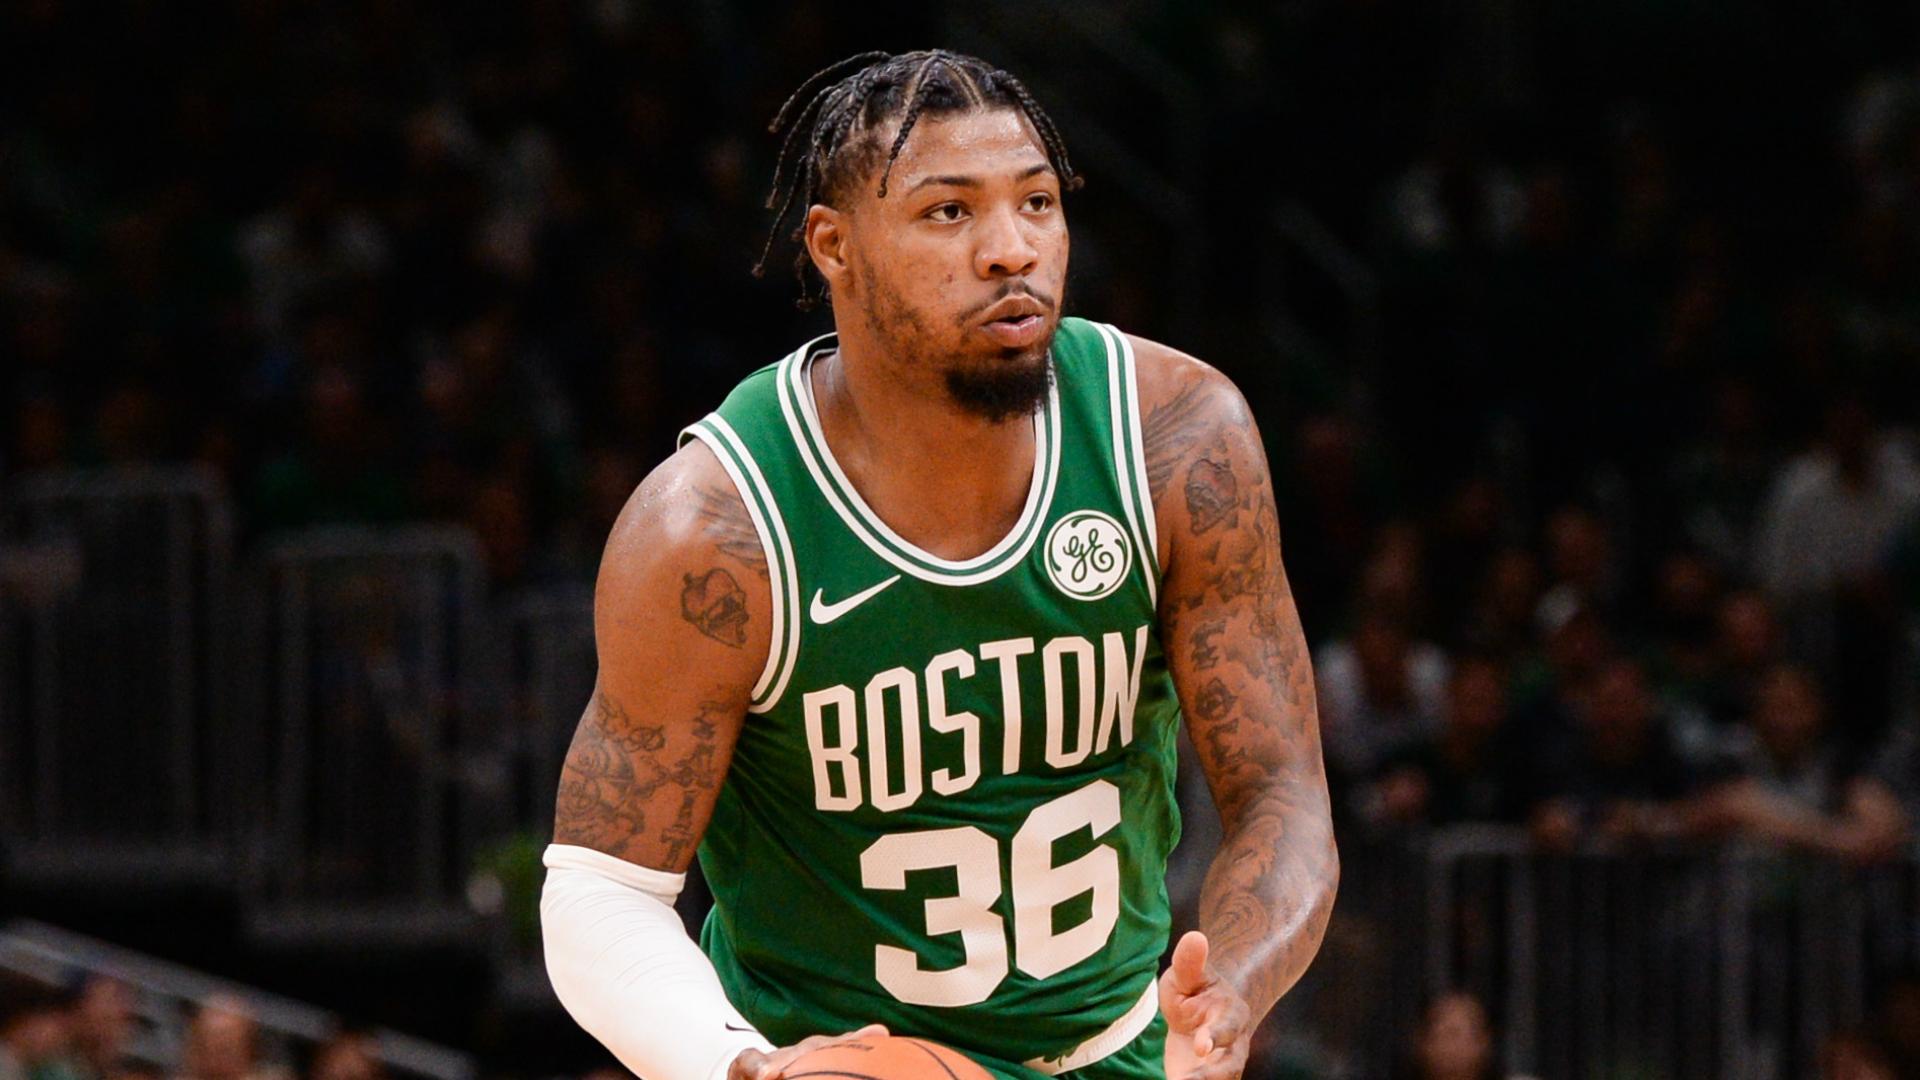 Marcus Smart rues late misfortune as Celtics' winning streak snapped